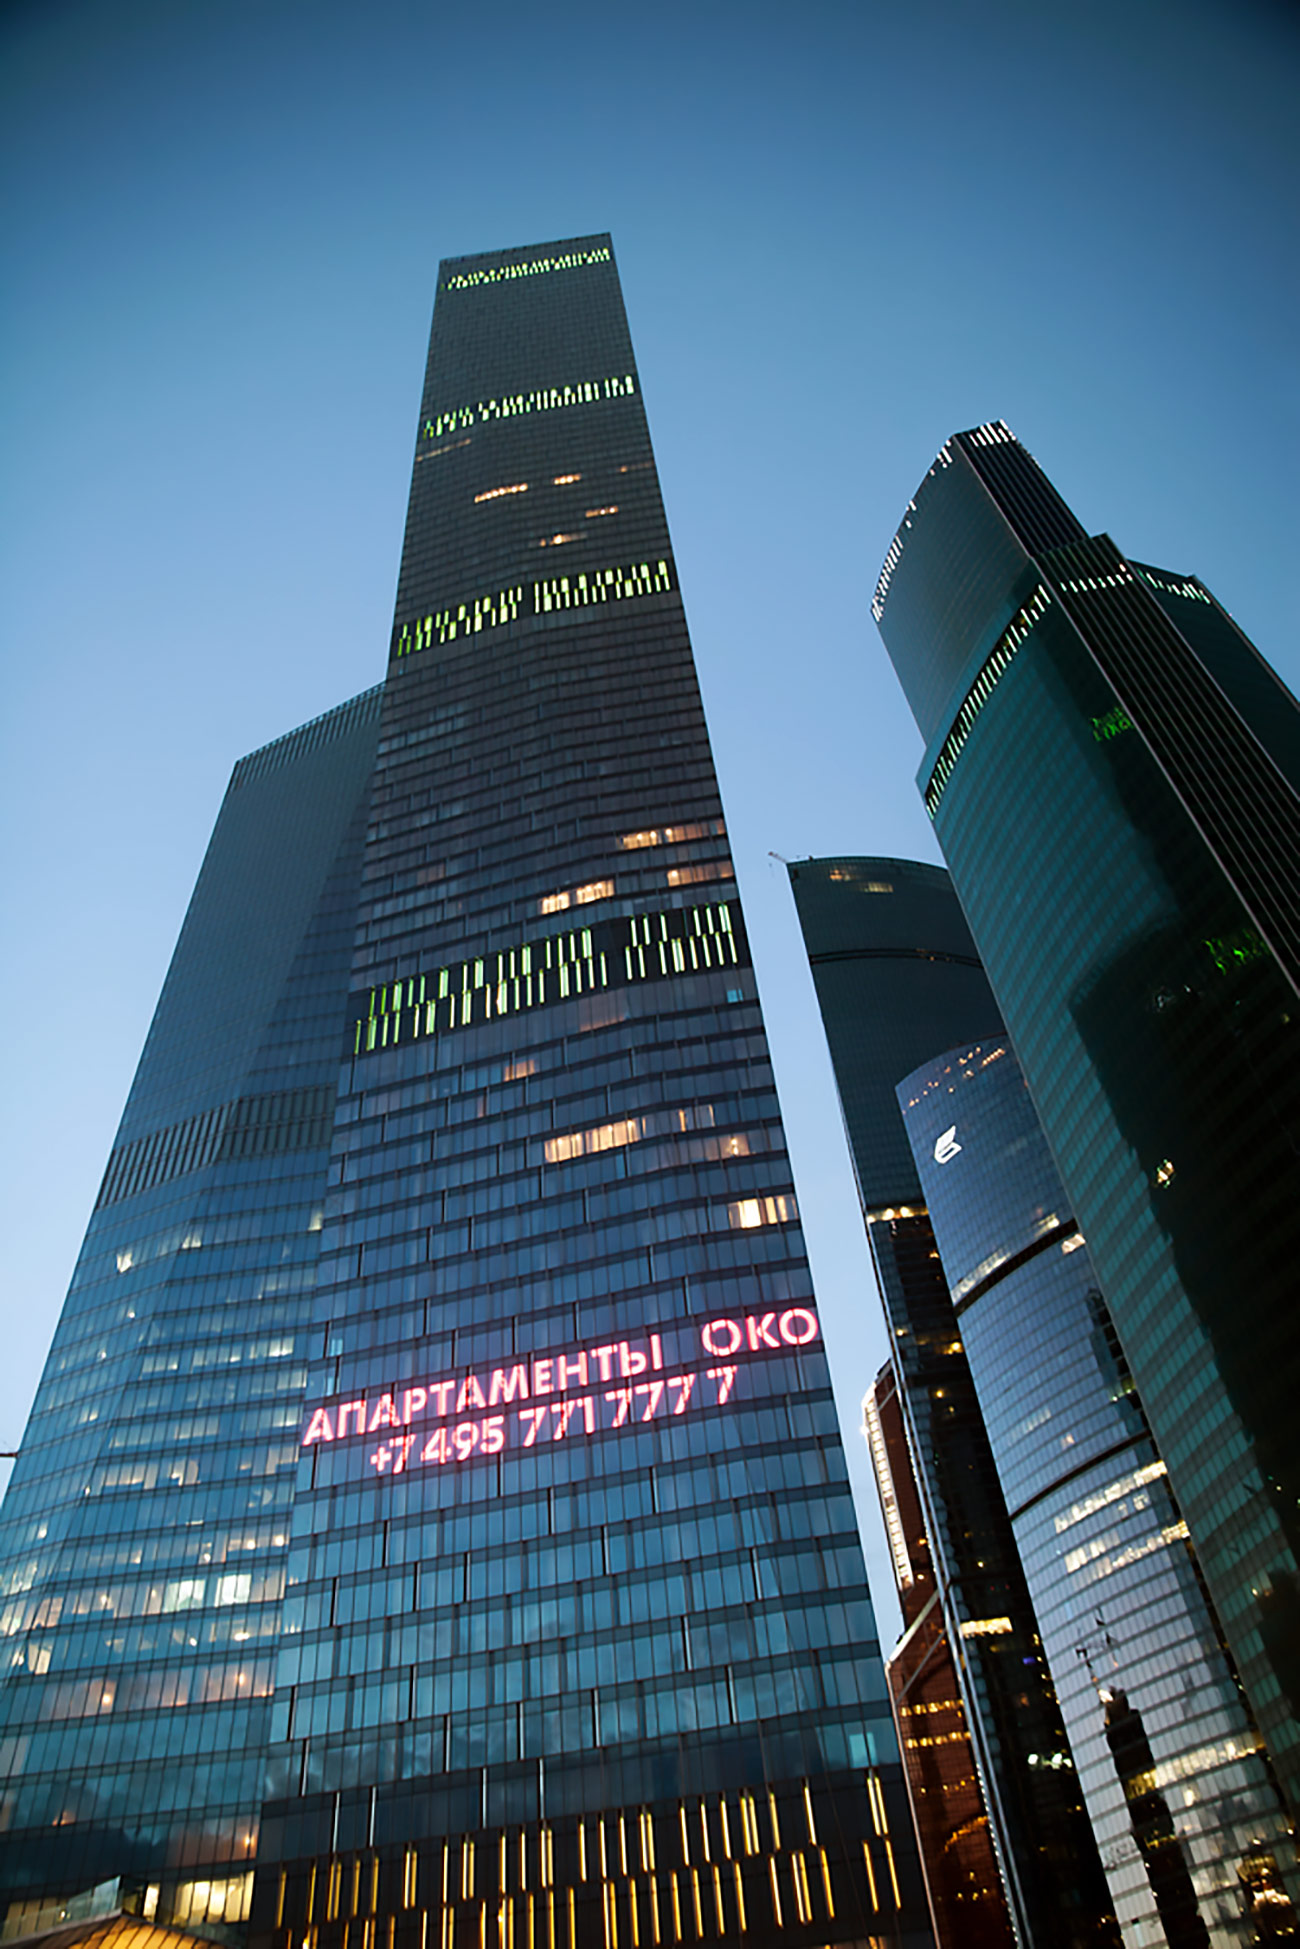 OKO (la torre del sur)  de Moscú / Legion Media